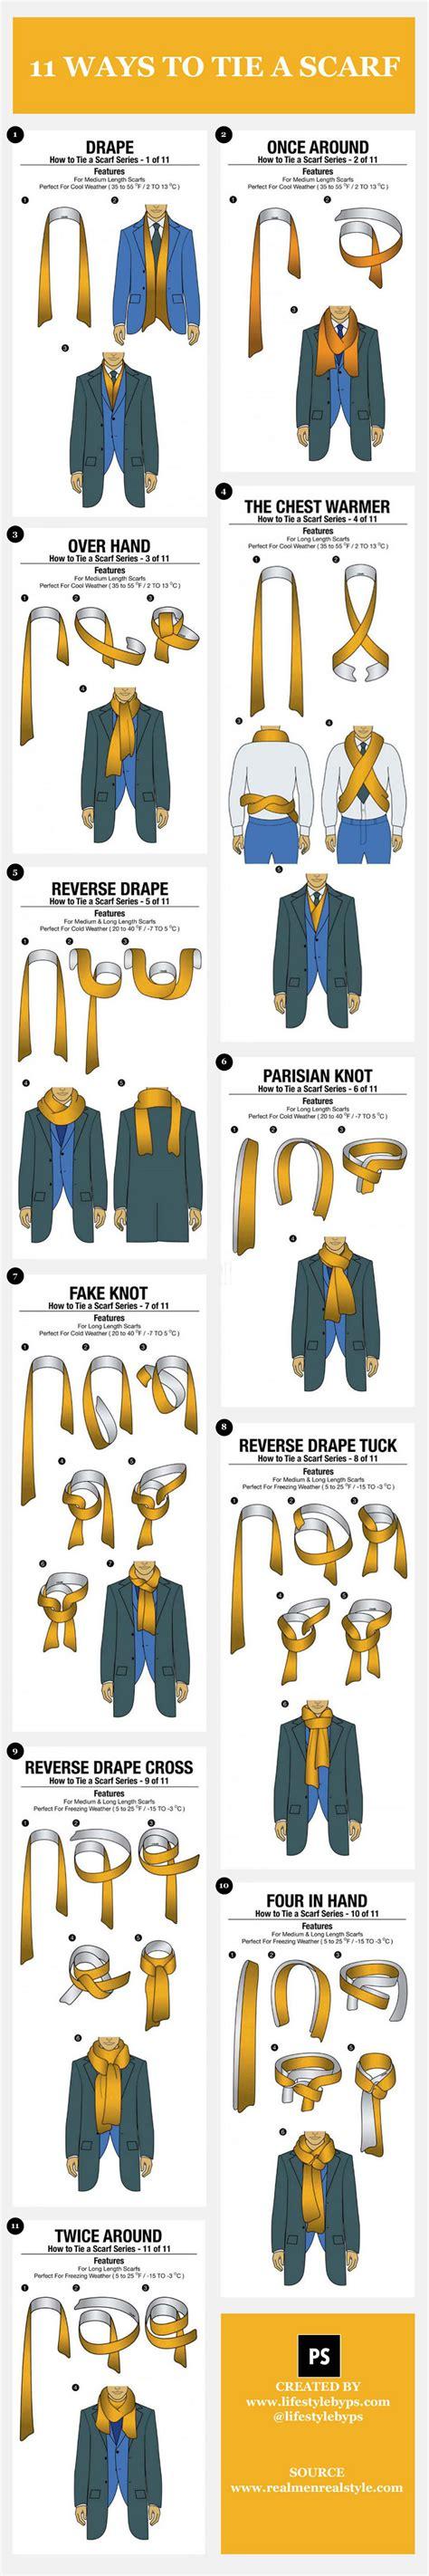 11 Different Ways To Tie A Scarf Brandongaillecom